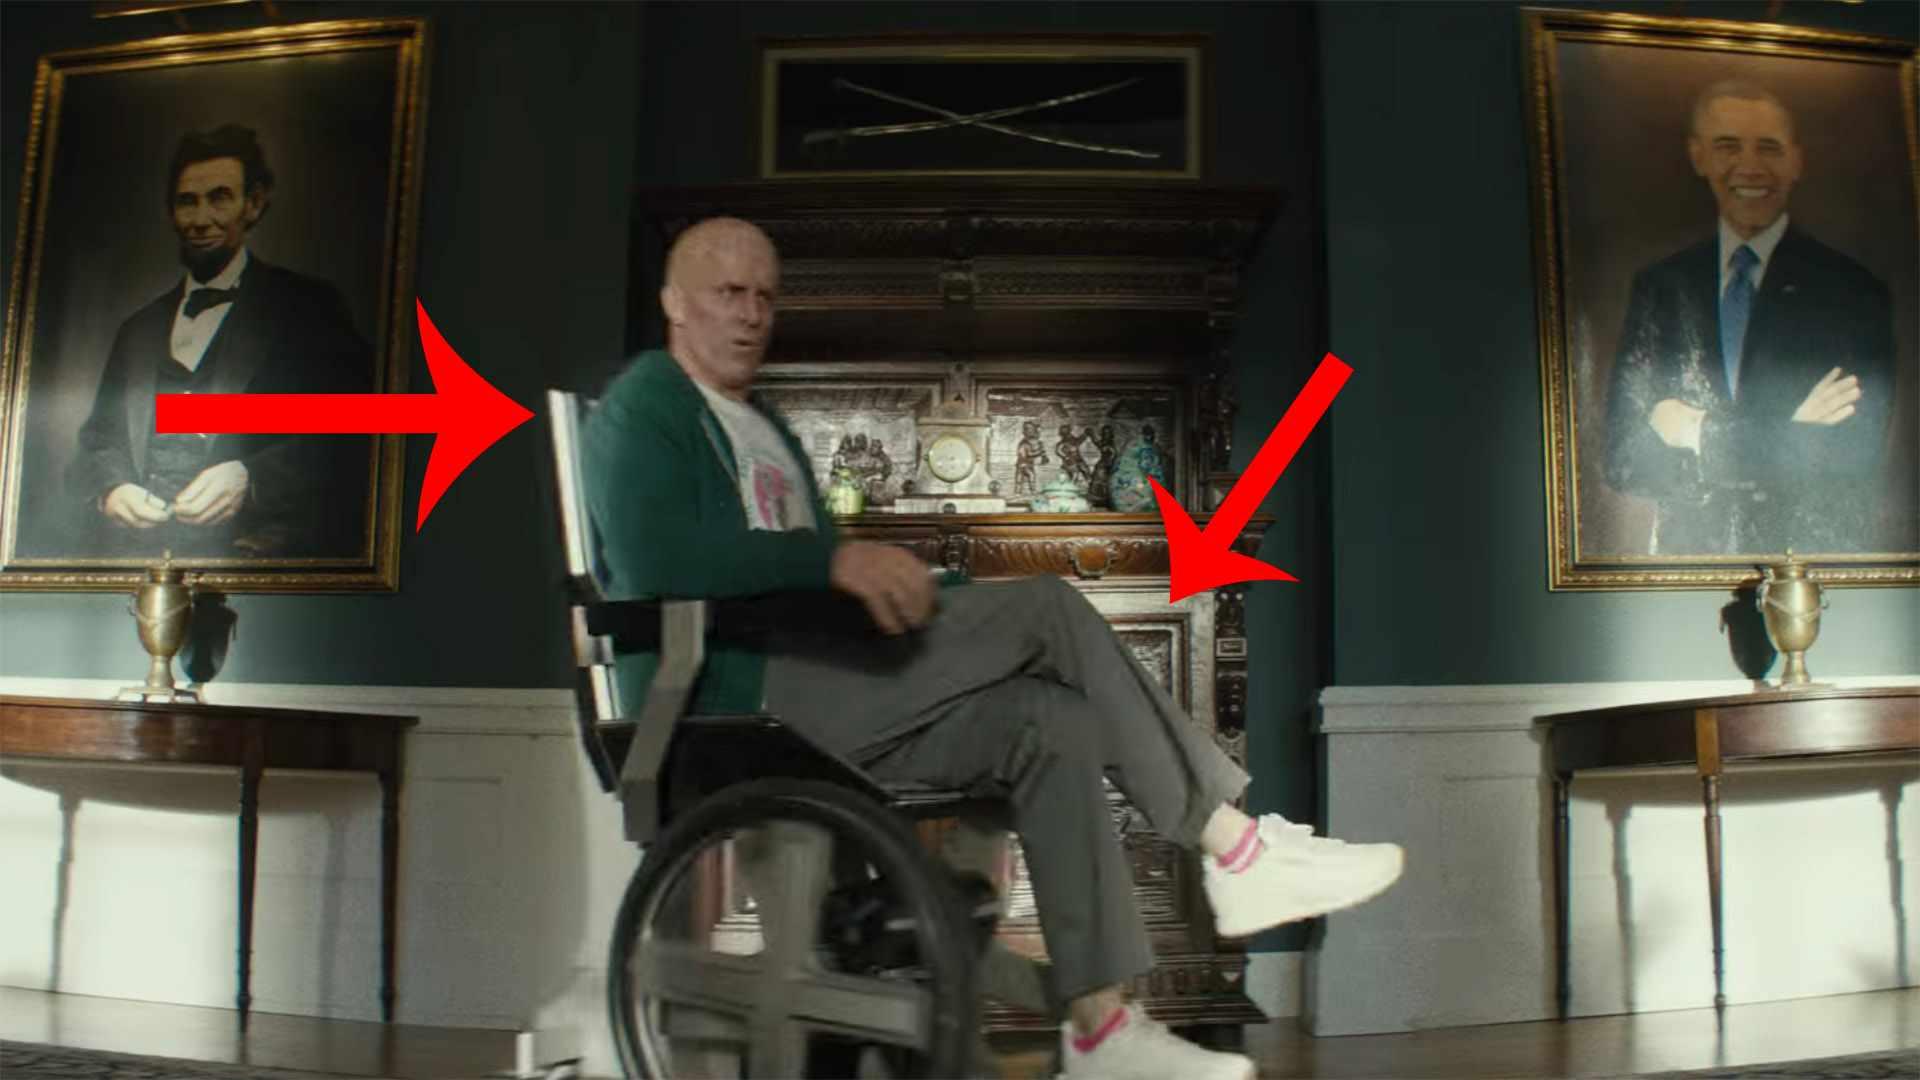 Ryan Reynolds sits in Professor X's wheelchair in the Deadpool 2 trailer